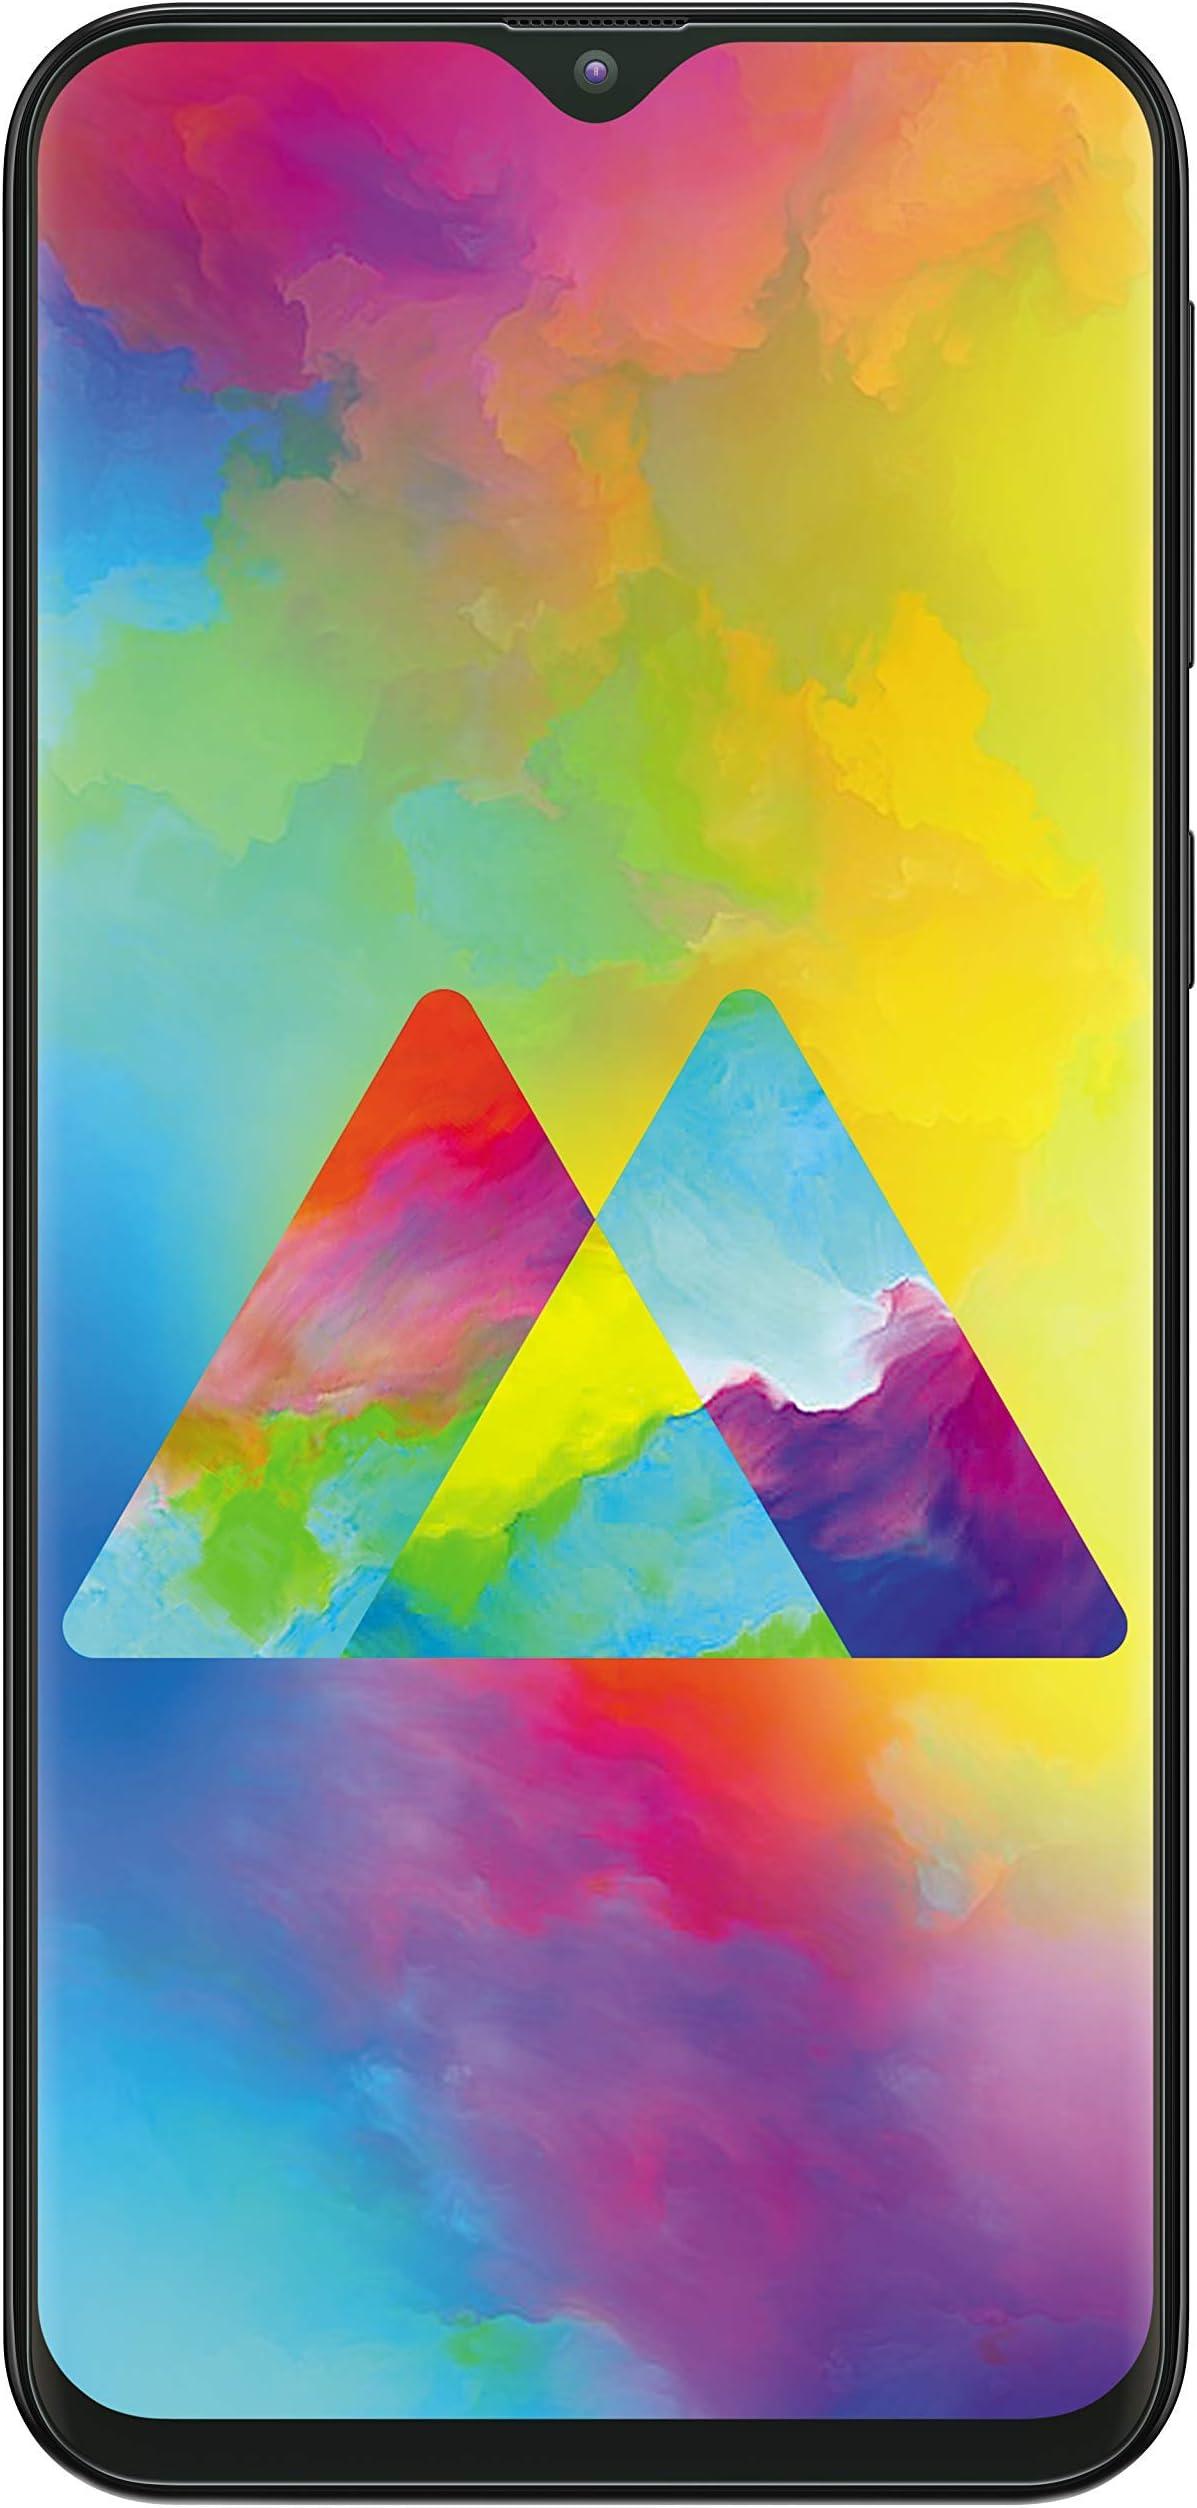 Samsung Galaxy M20 (Charcoal Black, 4 | 64GB) | Unlocked - Please Check specified Network Bands (Unlocked International Model, No Warranty)